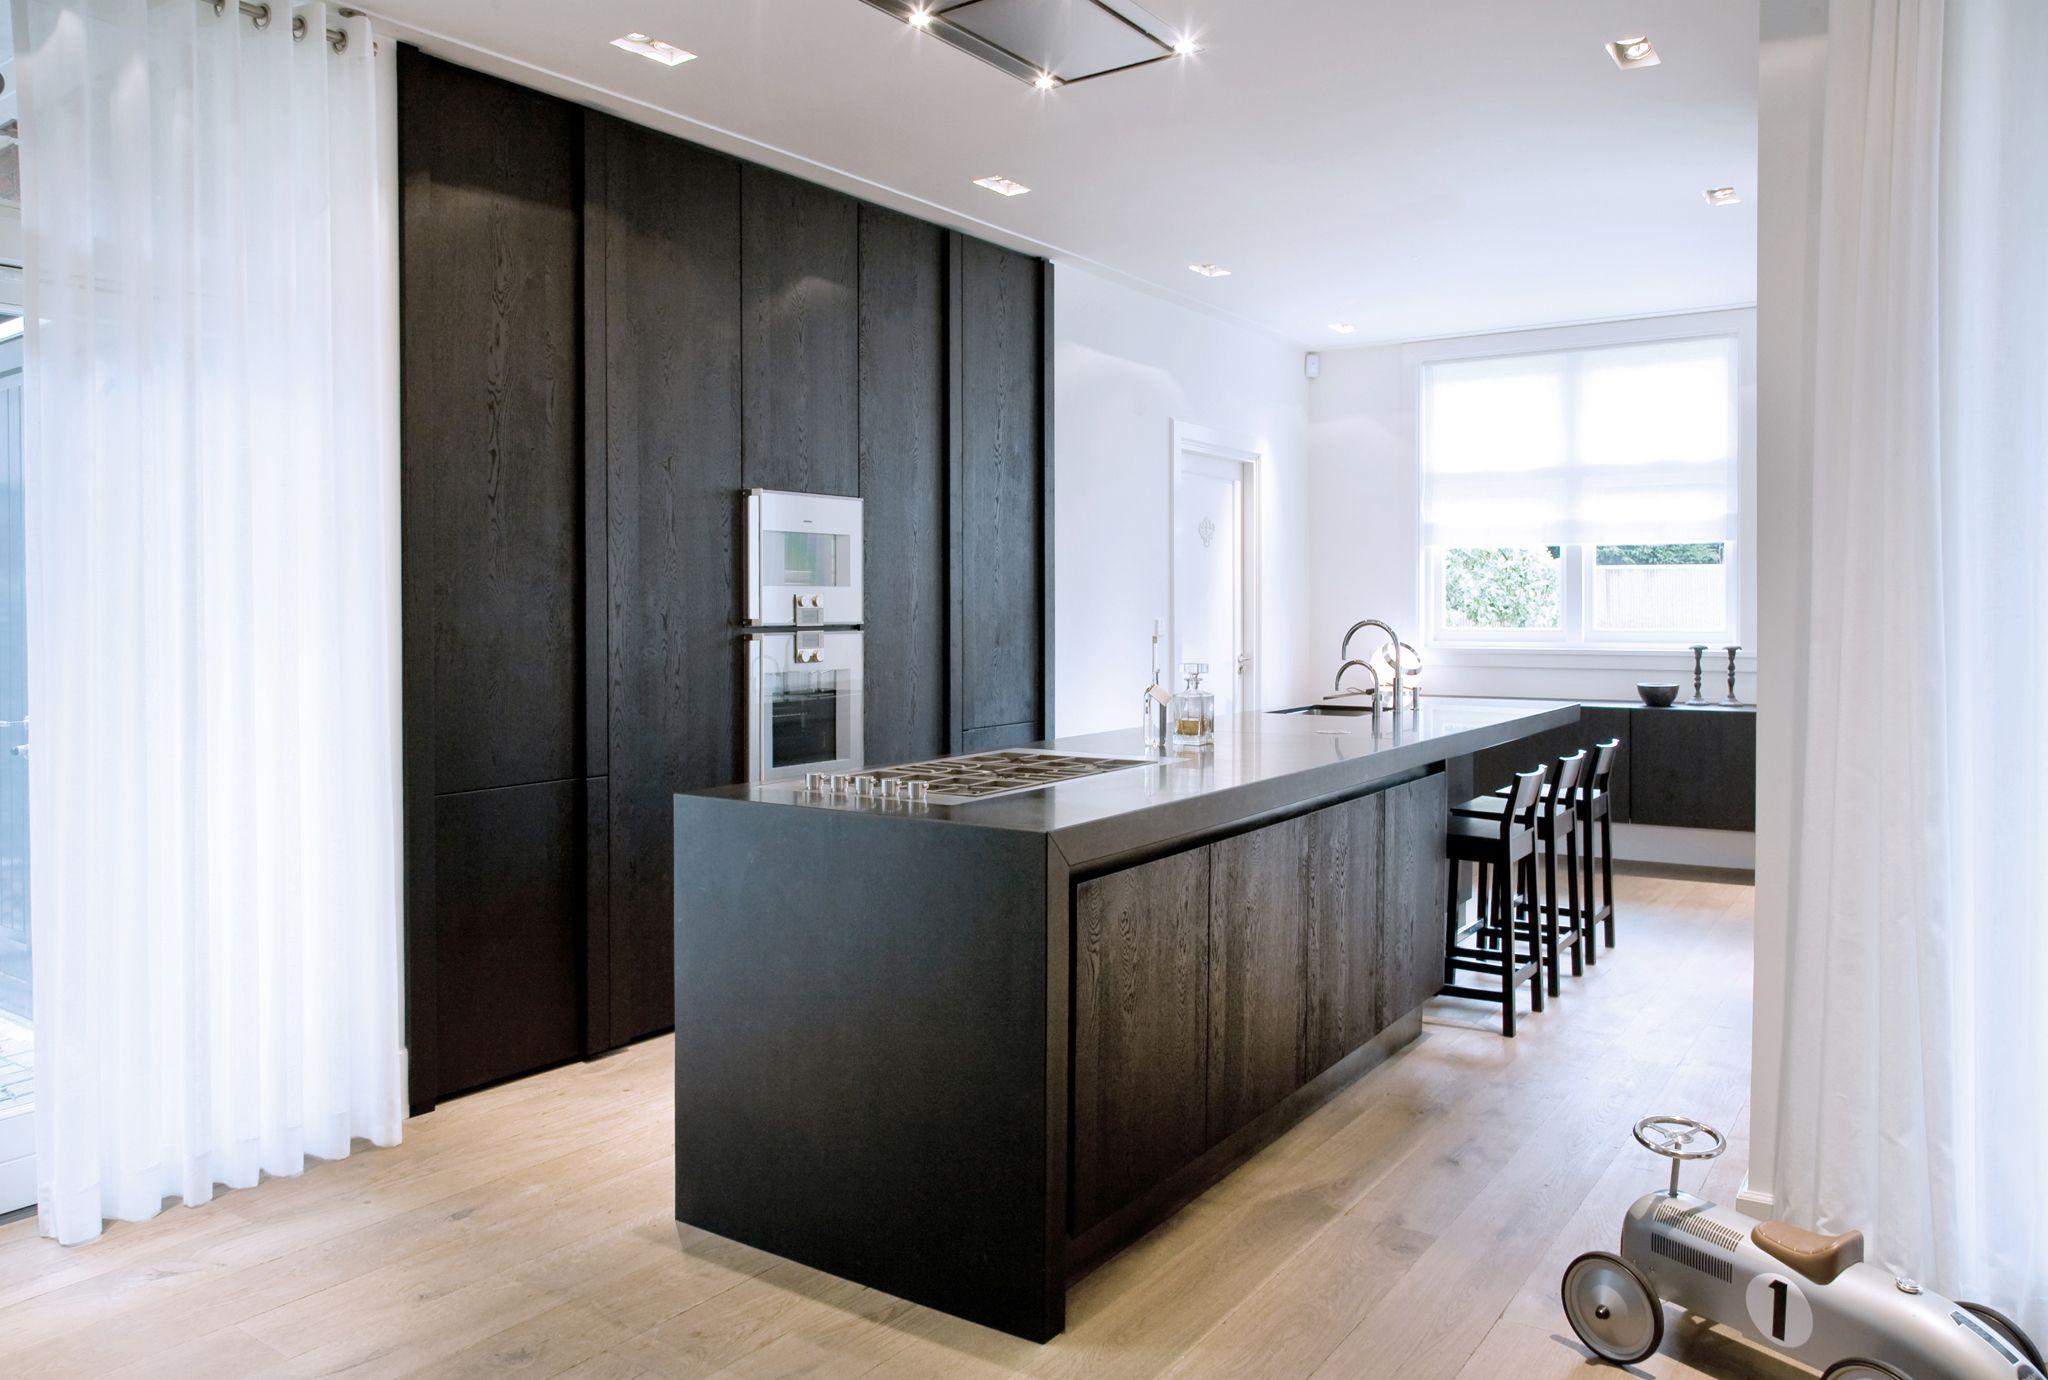 Culimaat High End Kitchens Interiors ITALIAANSE KEUKENS EN -  high end kitchen